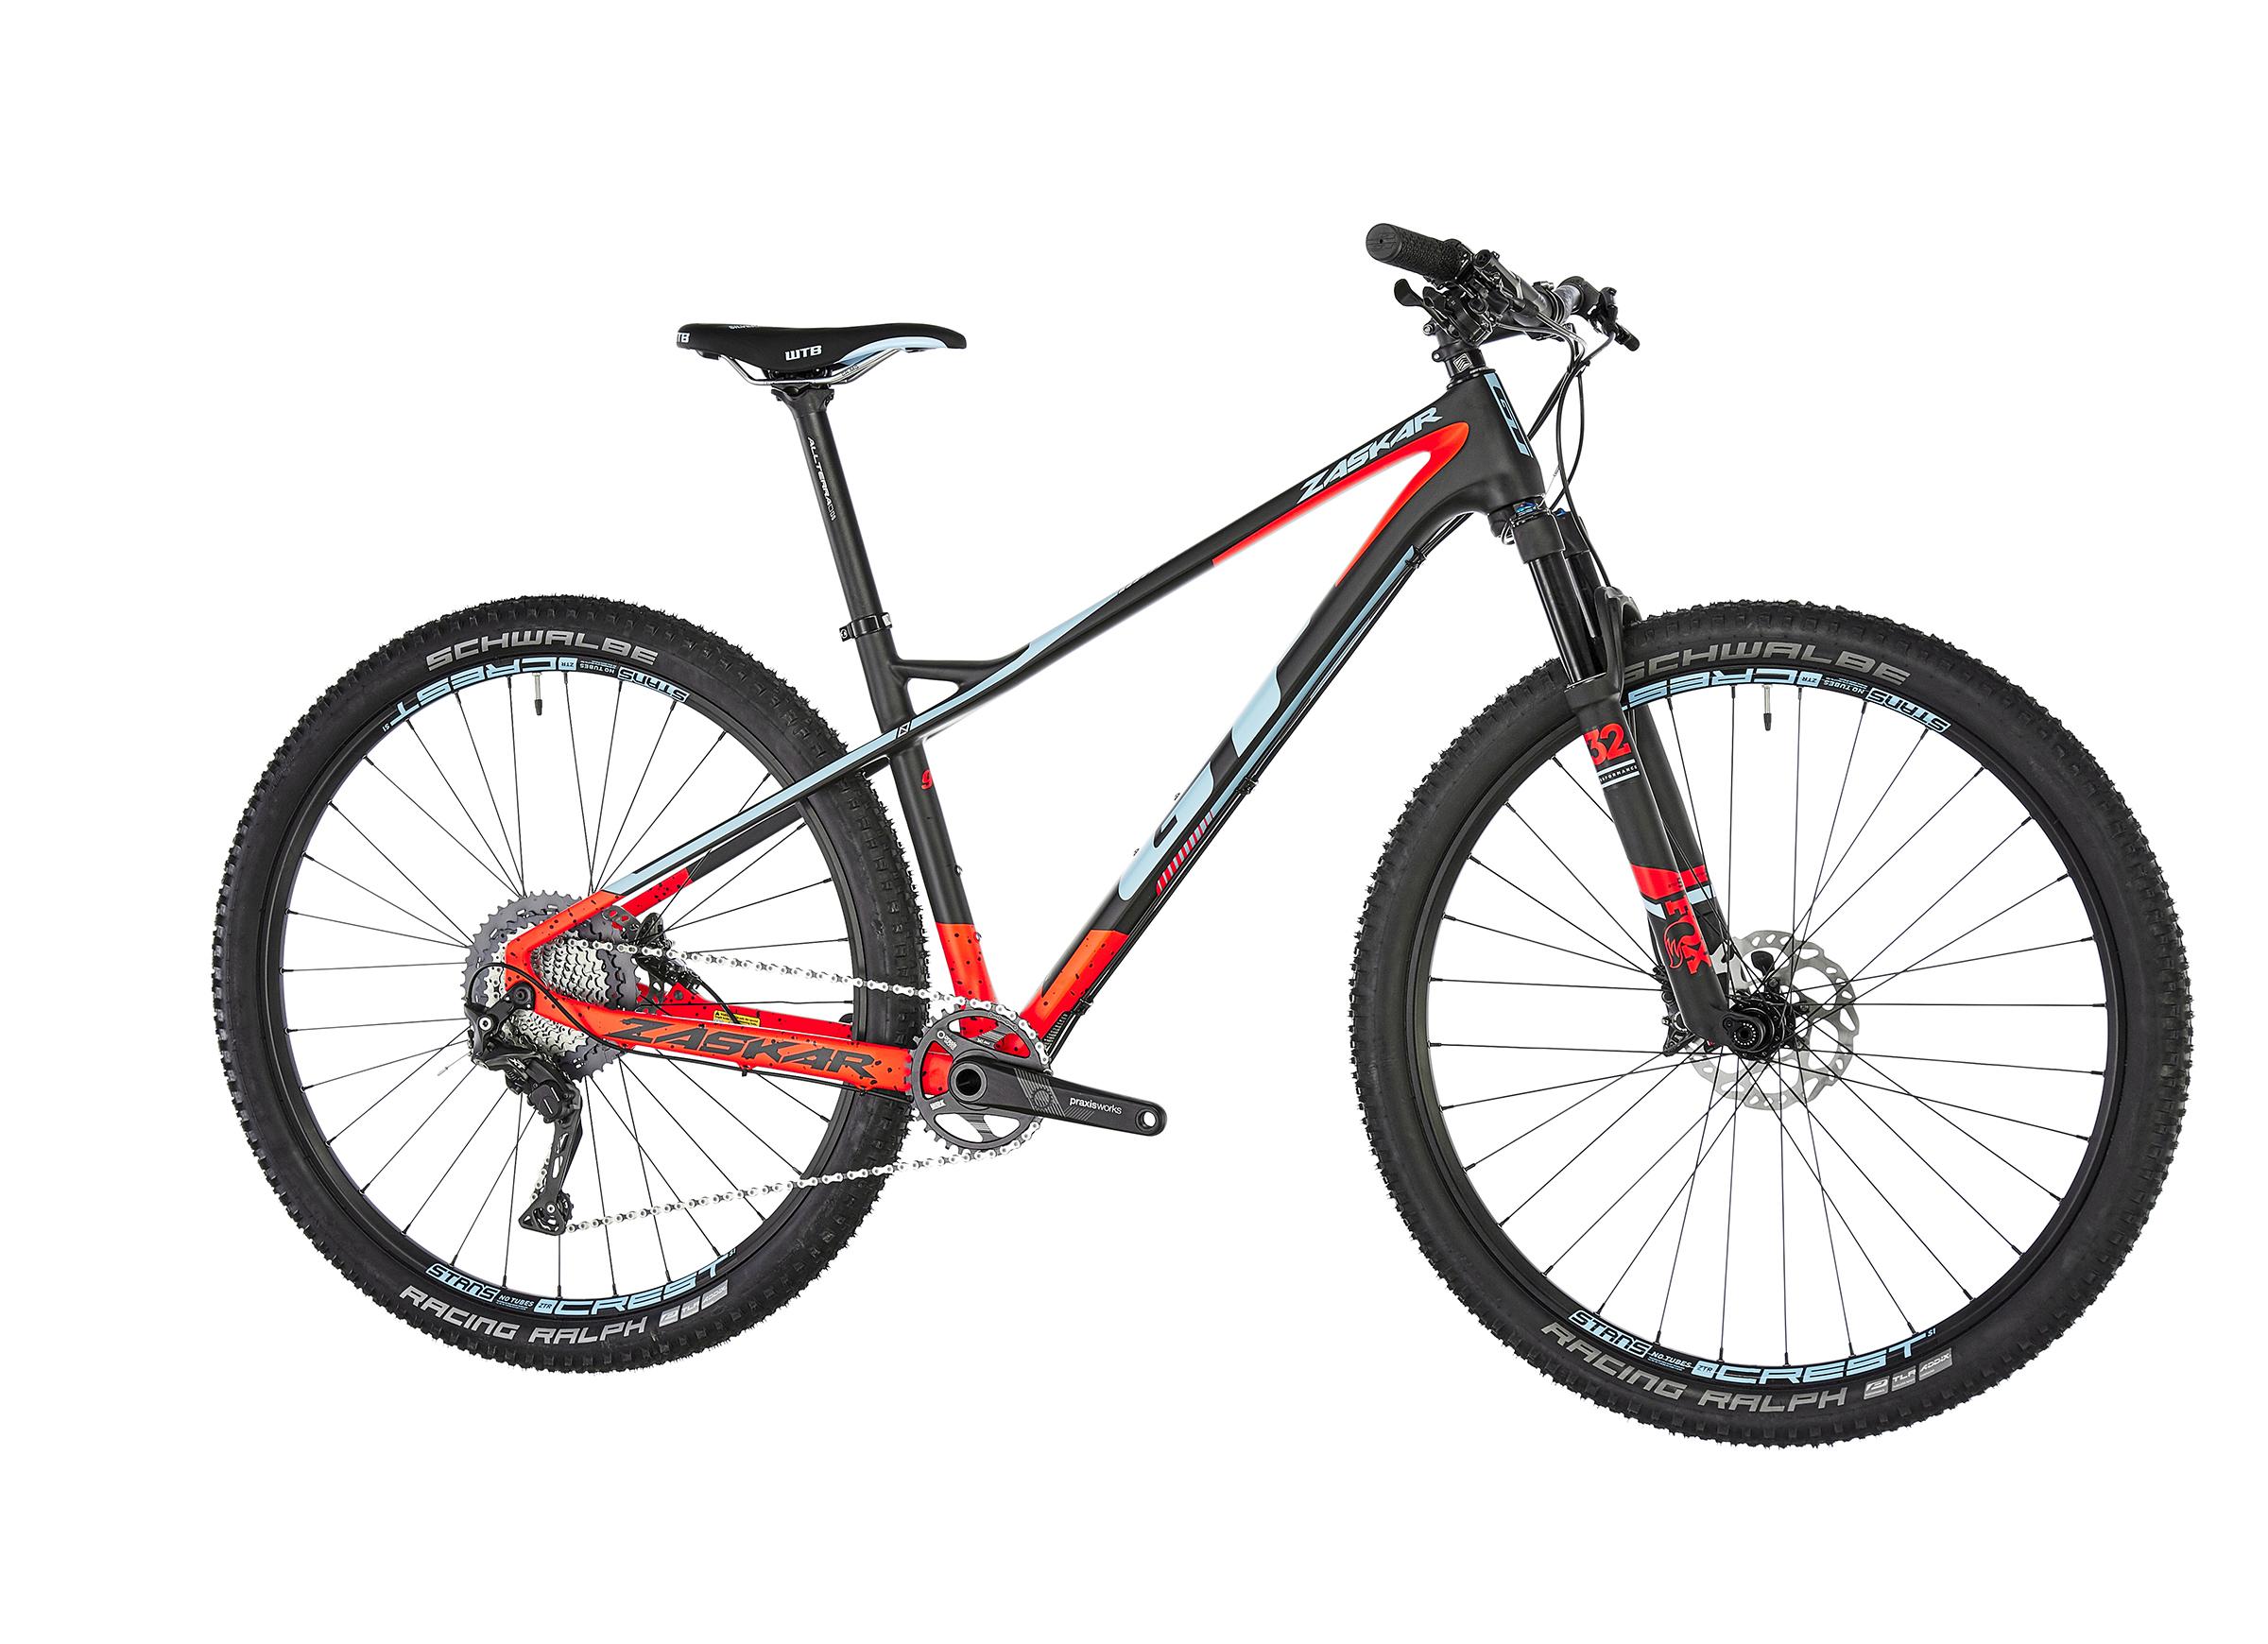 GT Bicycles Zaskar Carbon Expert 29 inches raw